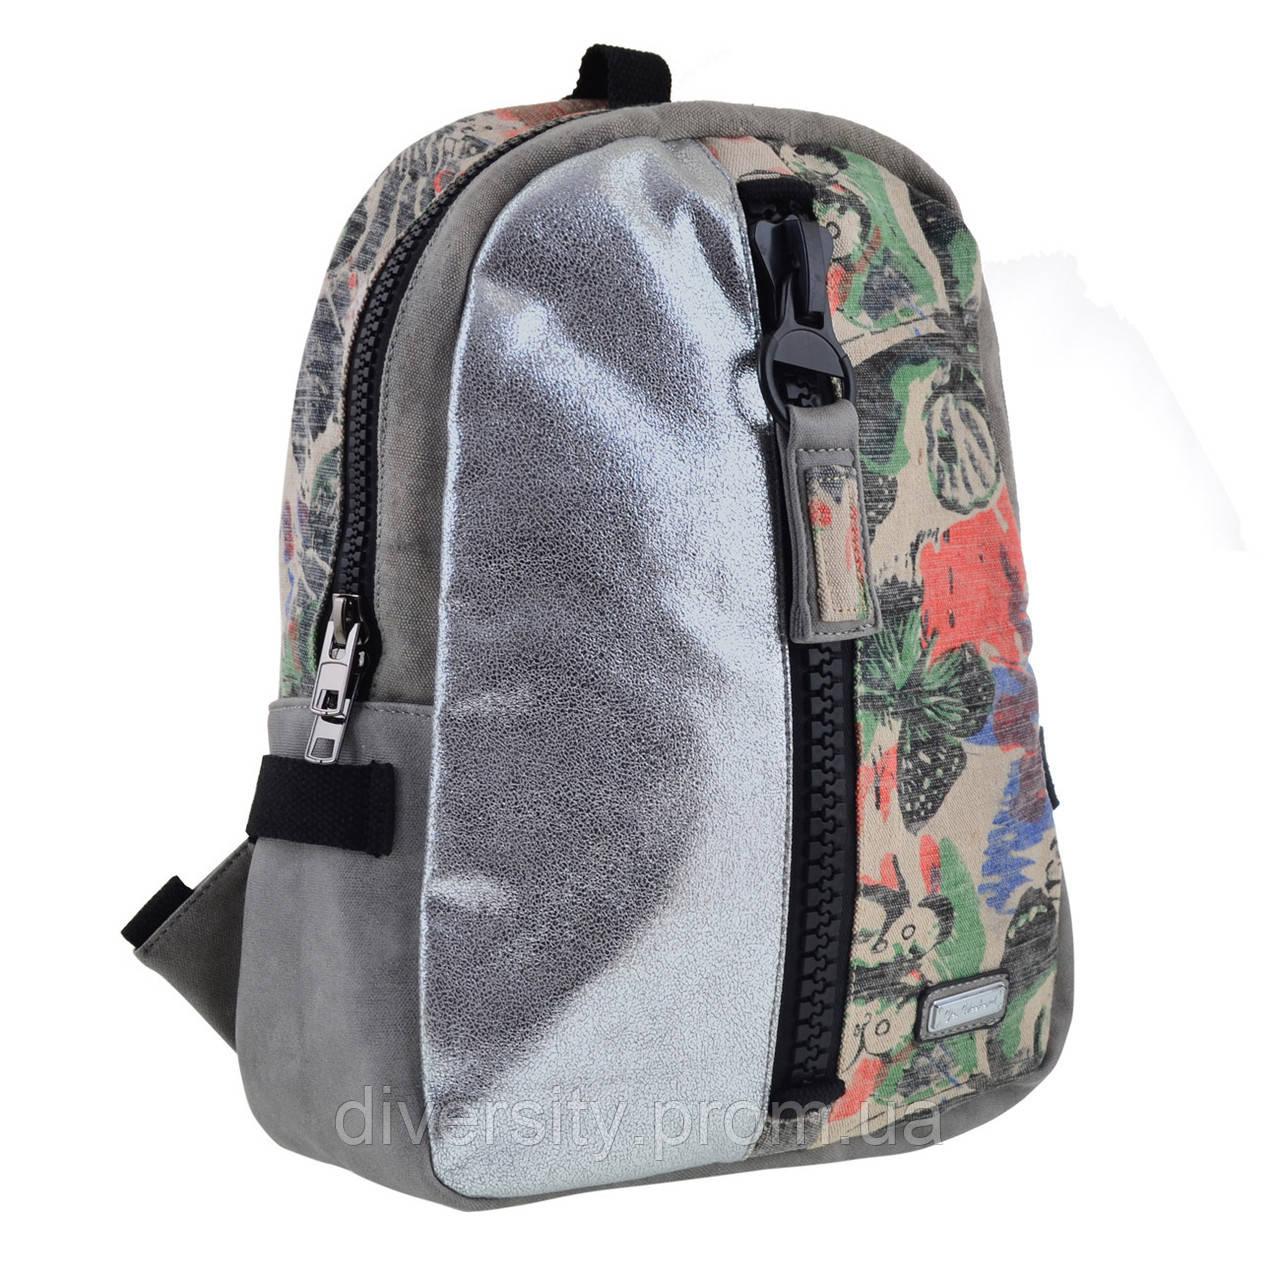 Женский рюкзак YES YW-46 «Doppio» серебряный